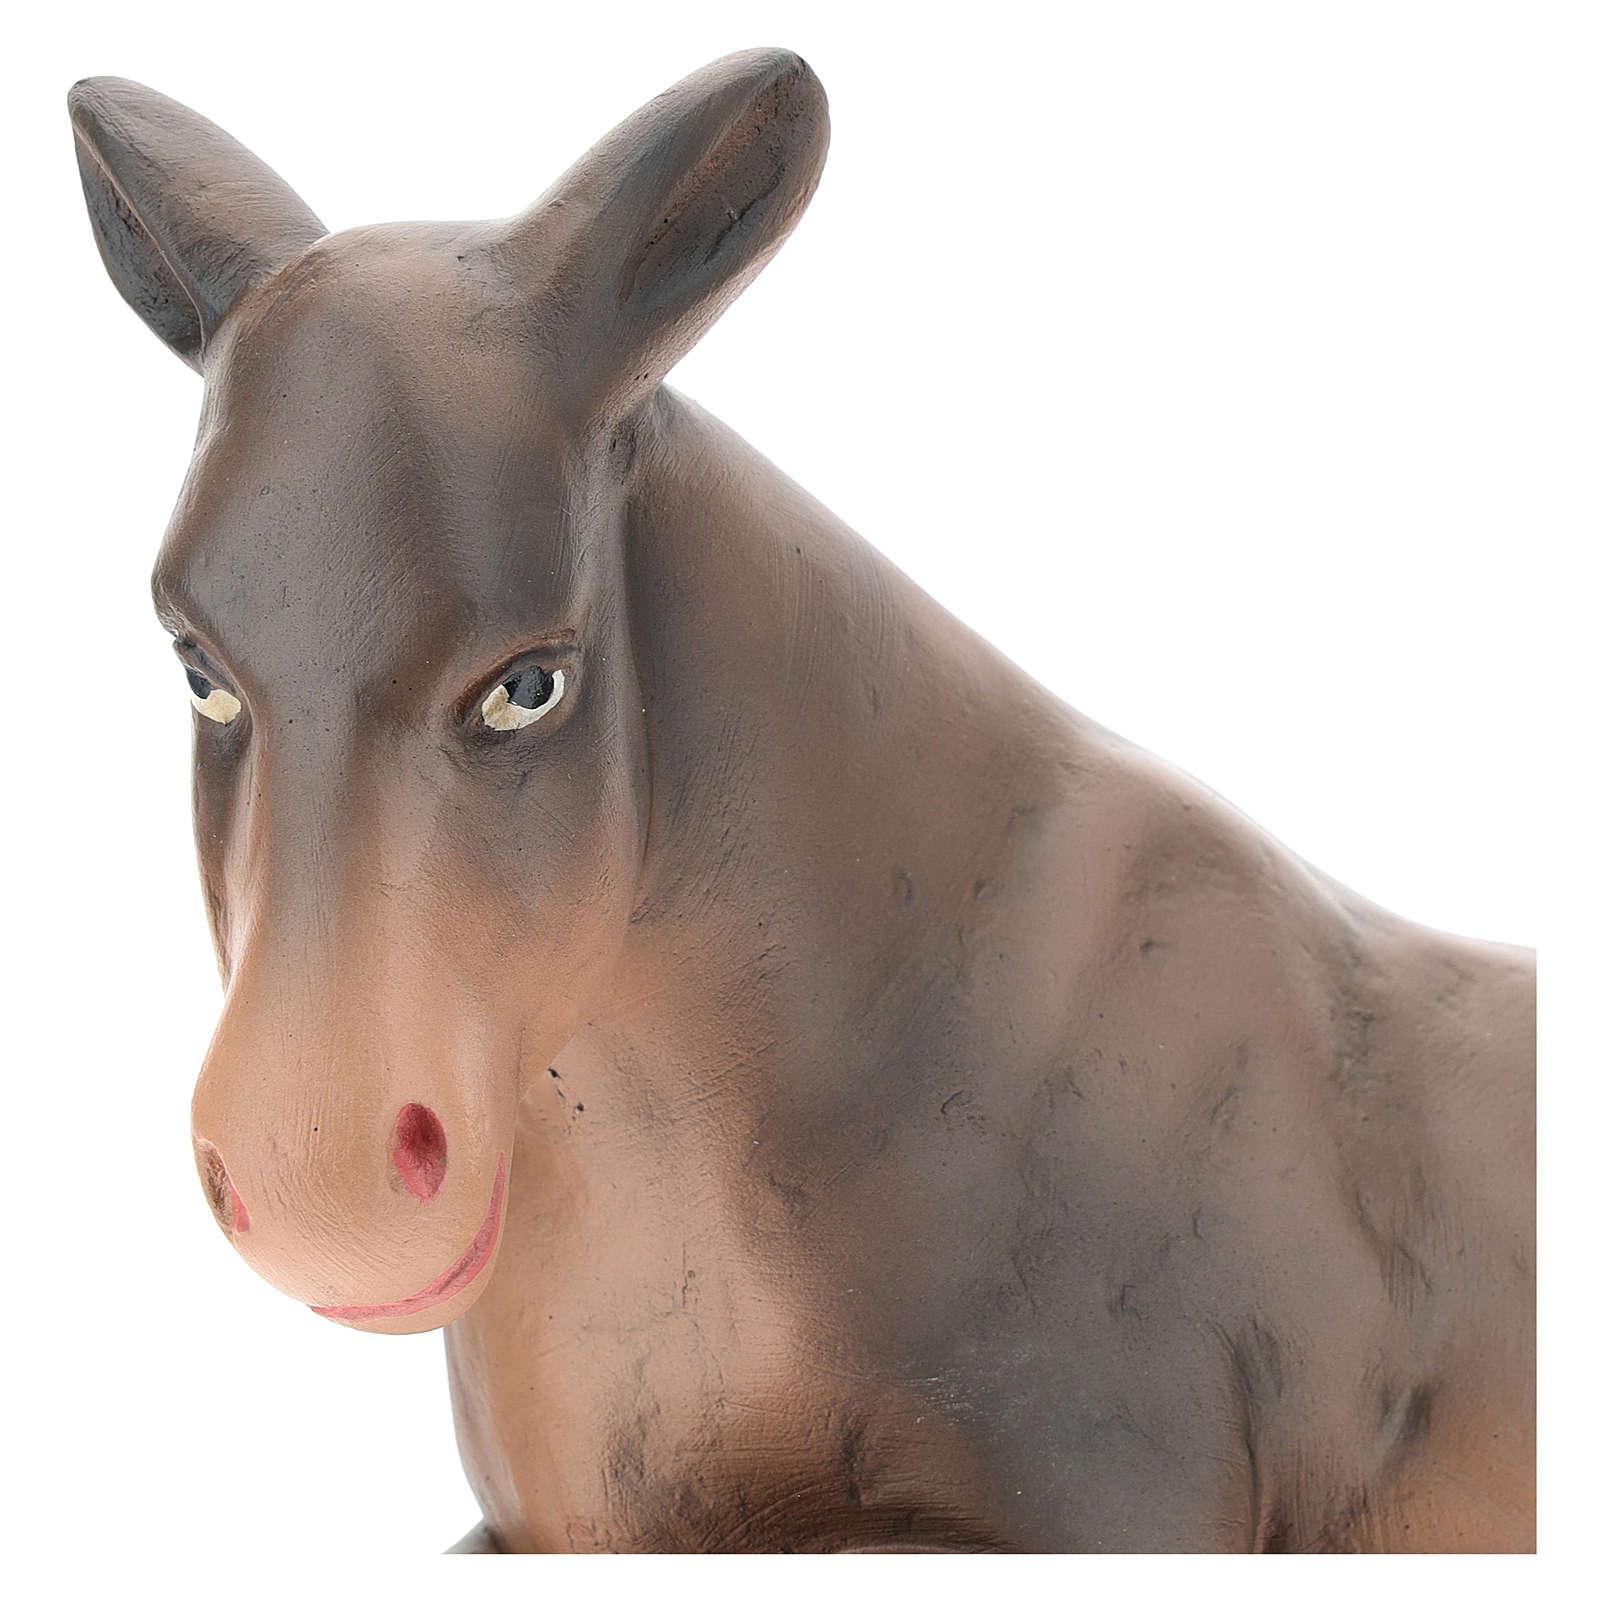 Santon âne plâtre peint à la main 30 cm Arte Barsanti 4